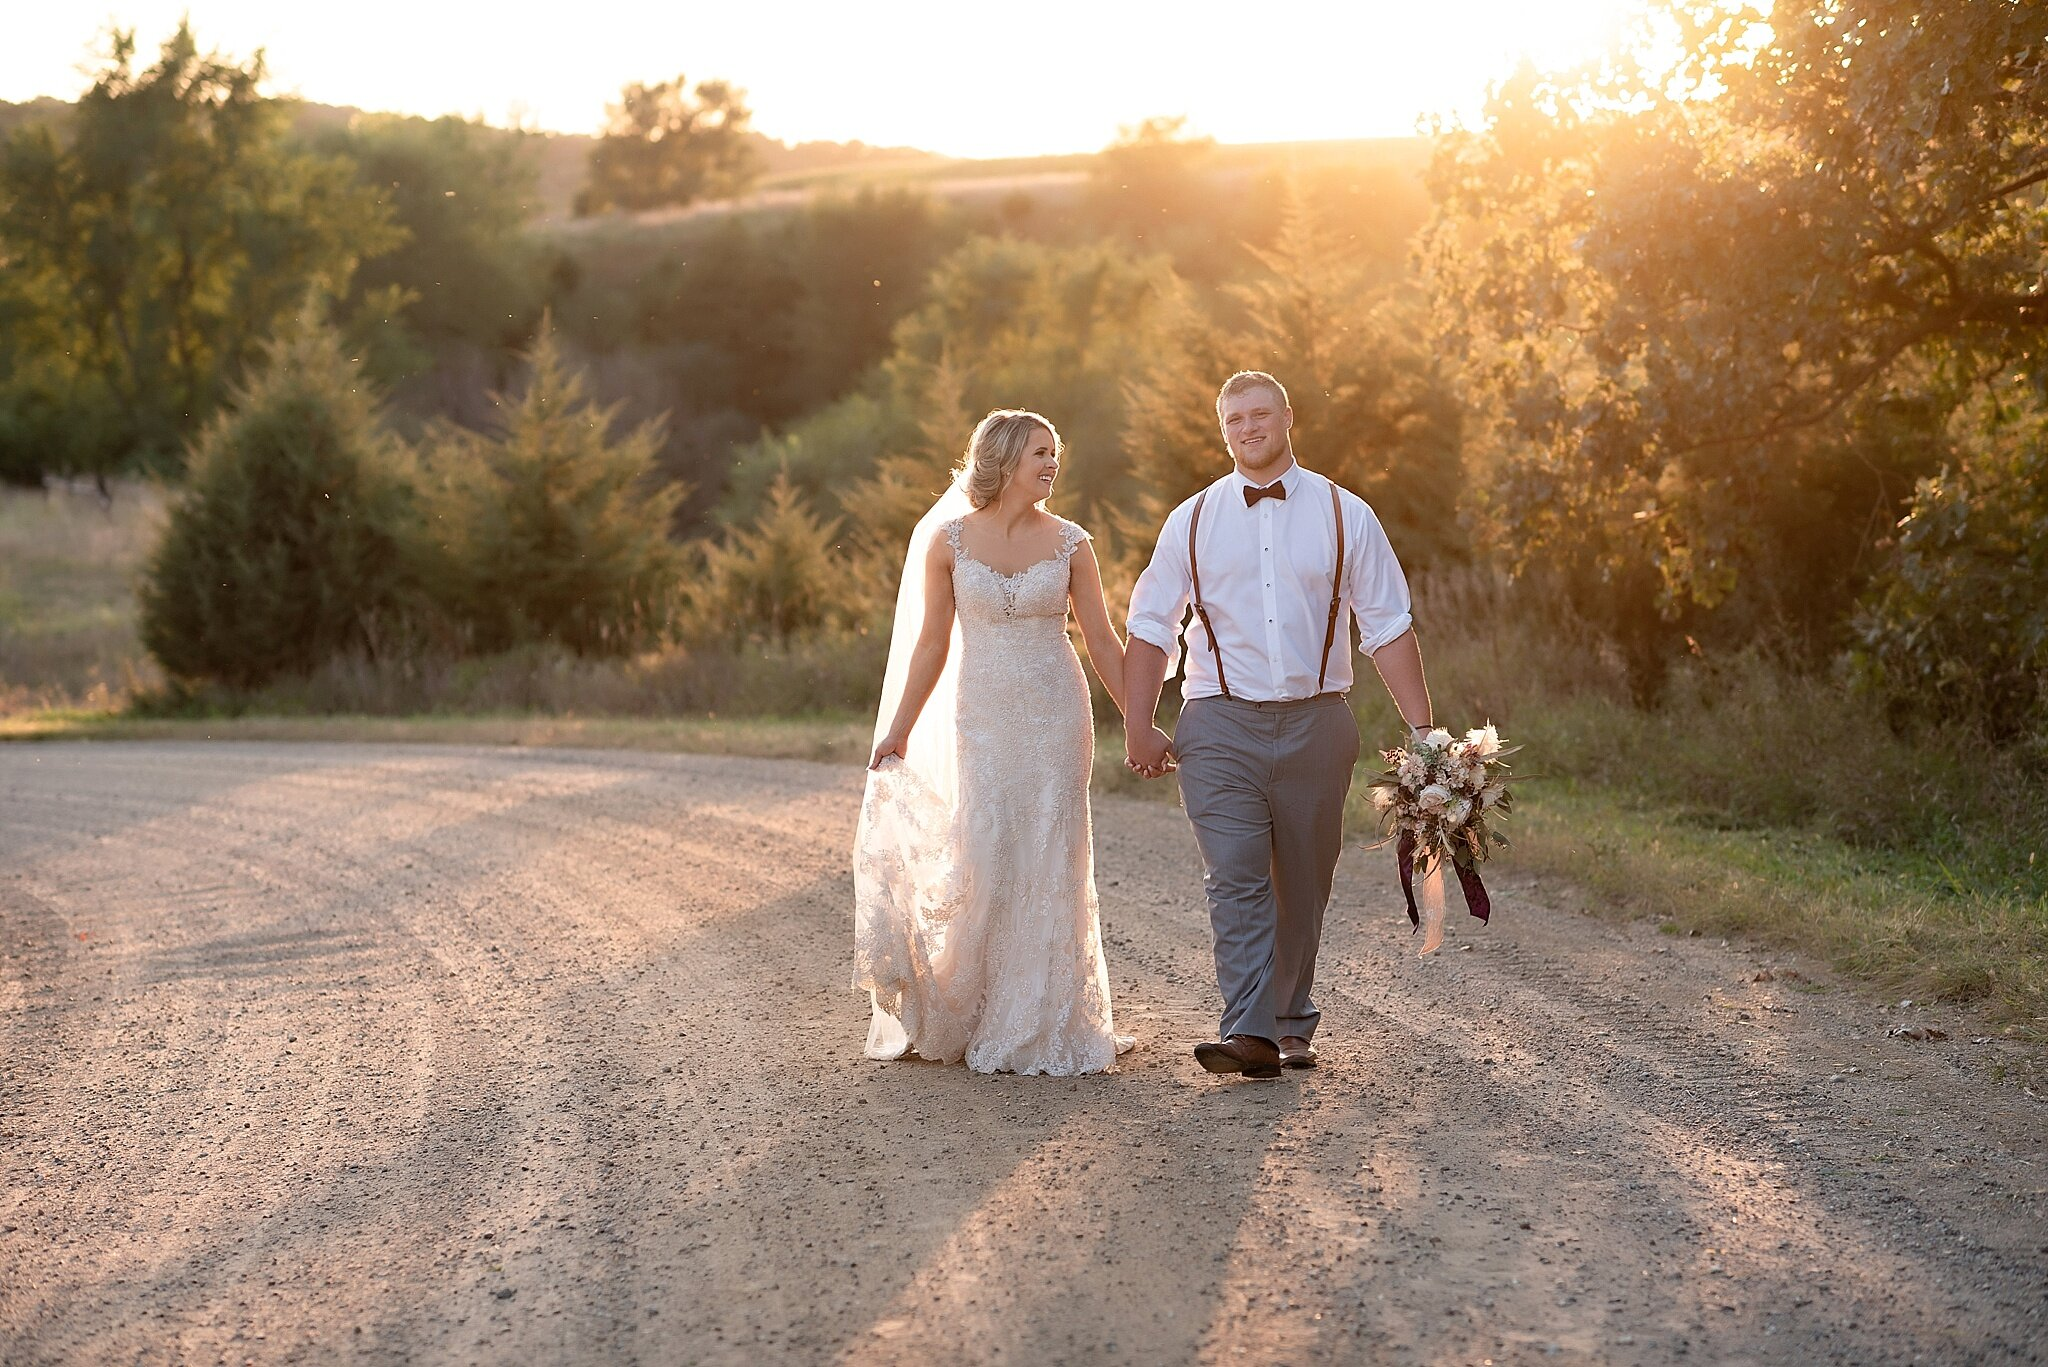 kate jones studios bride and groom sunset portrait wedding photographer